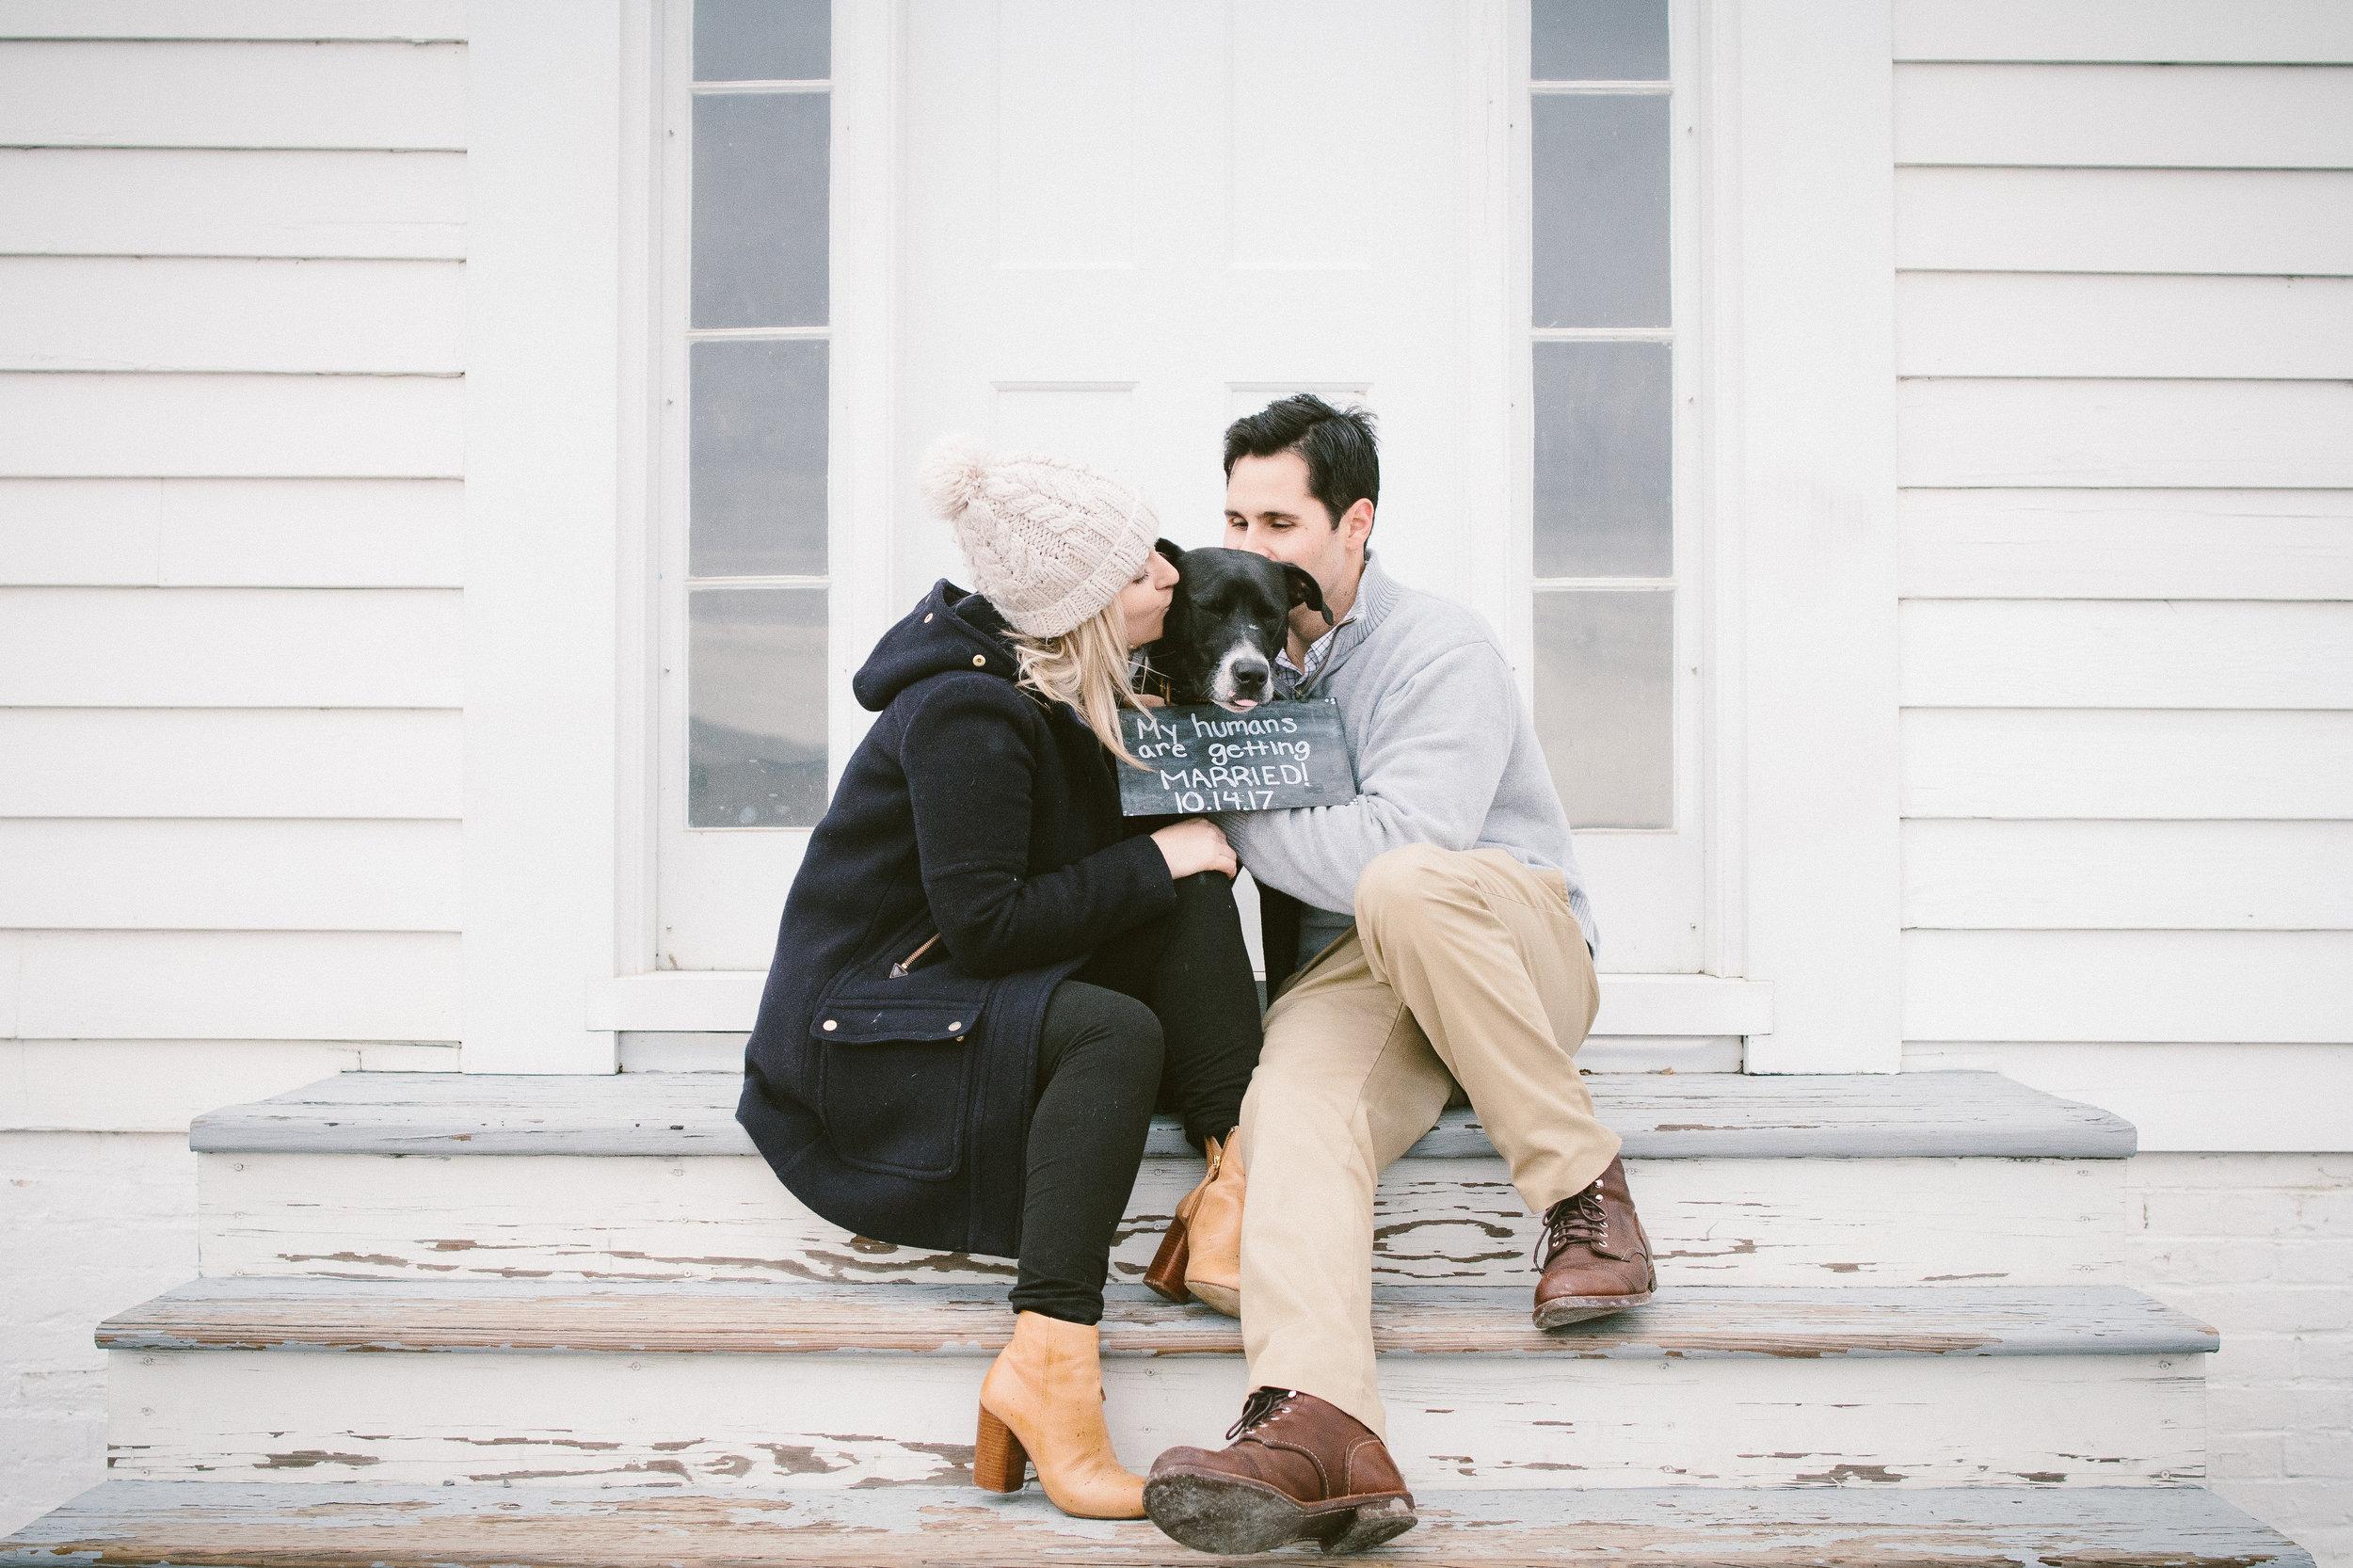 MP_16.12.18_Nick & Kendall Engagement Shoot-0034.jpg